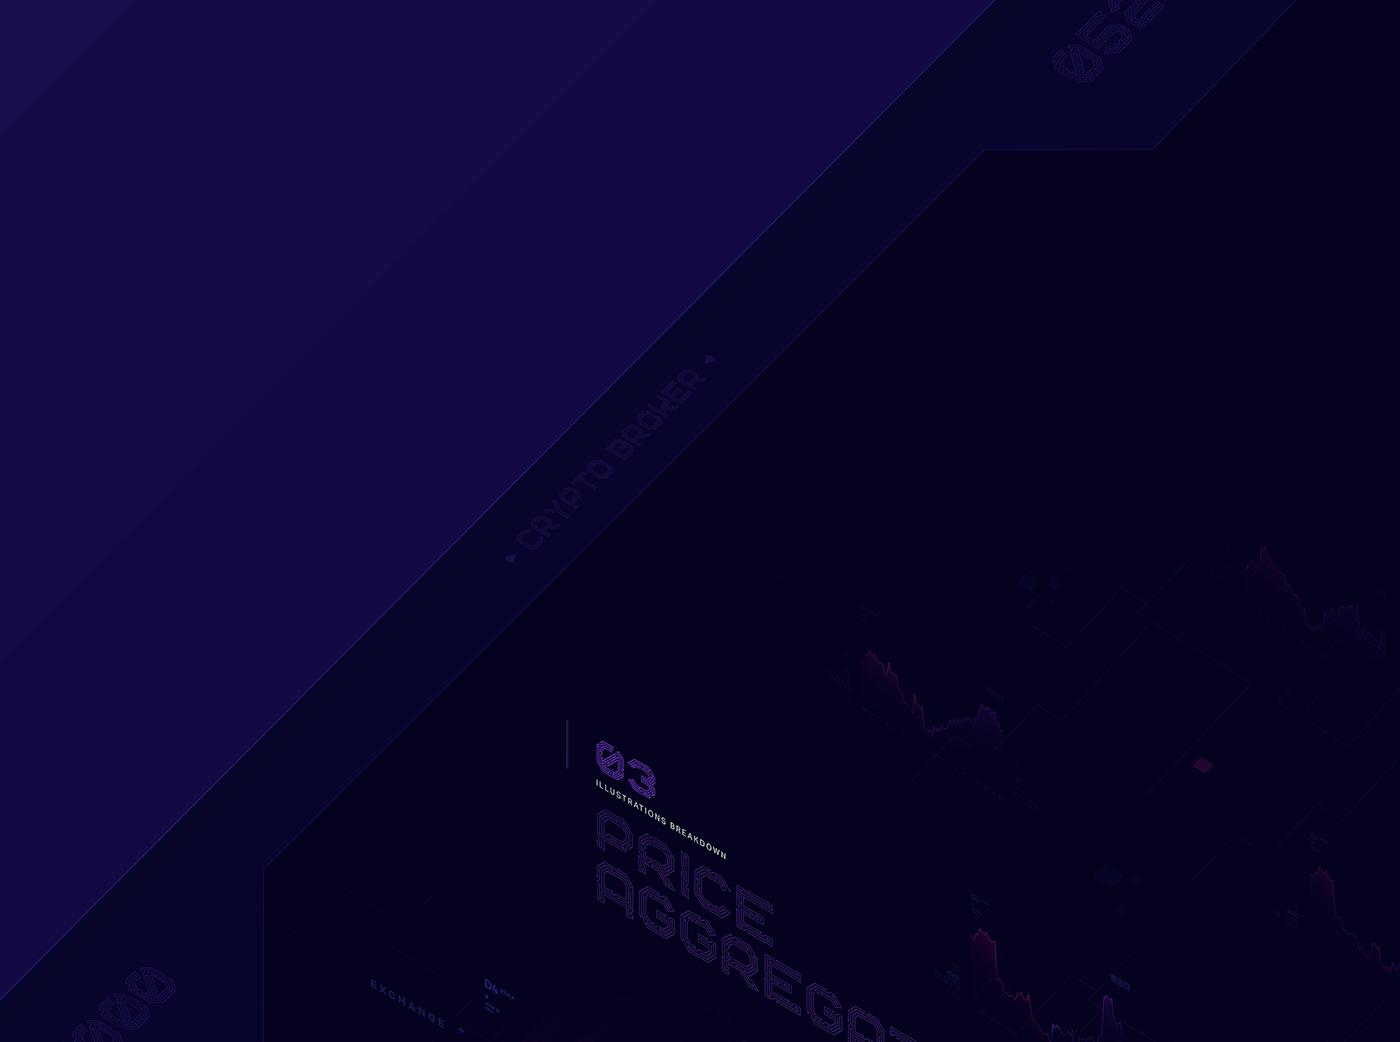 UI ux icon design  crypto blockchain Ico tokens Web Design  ILLUSTRATION  WALLET